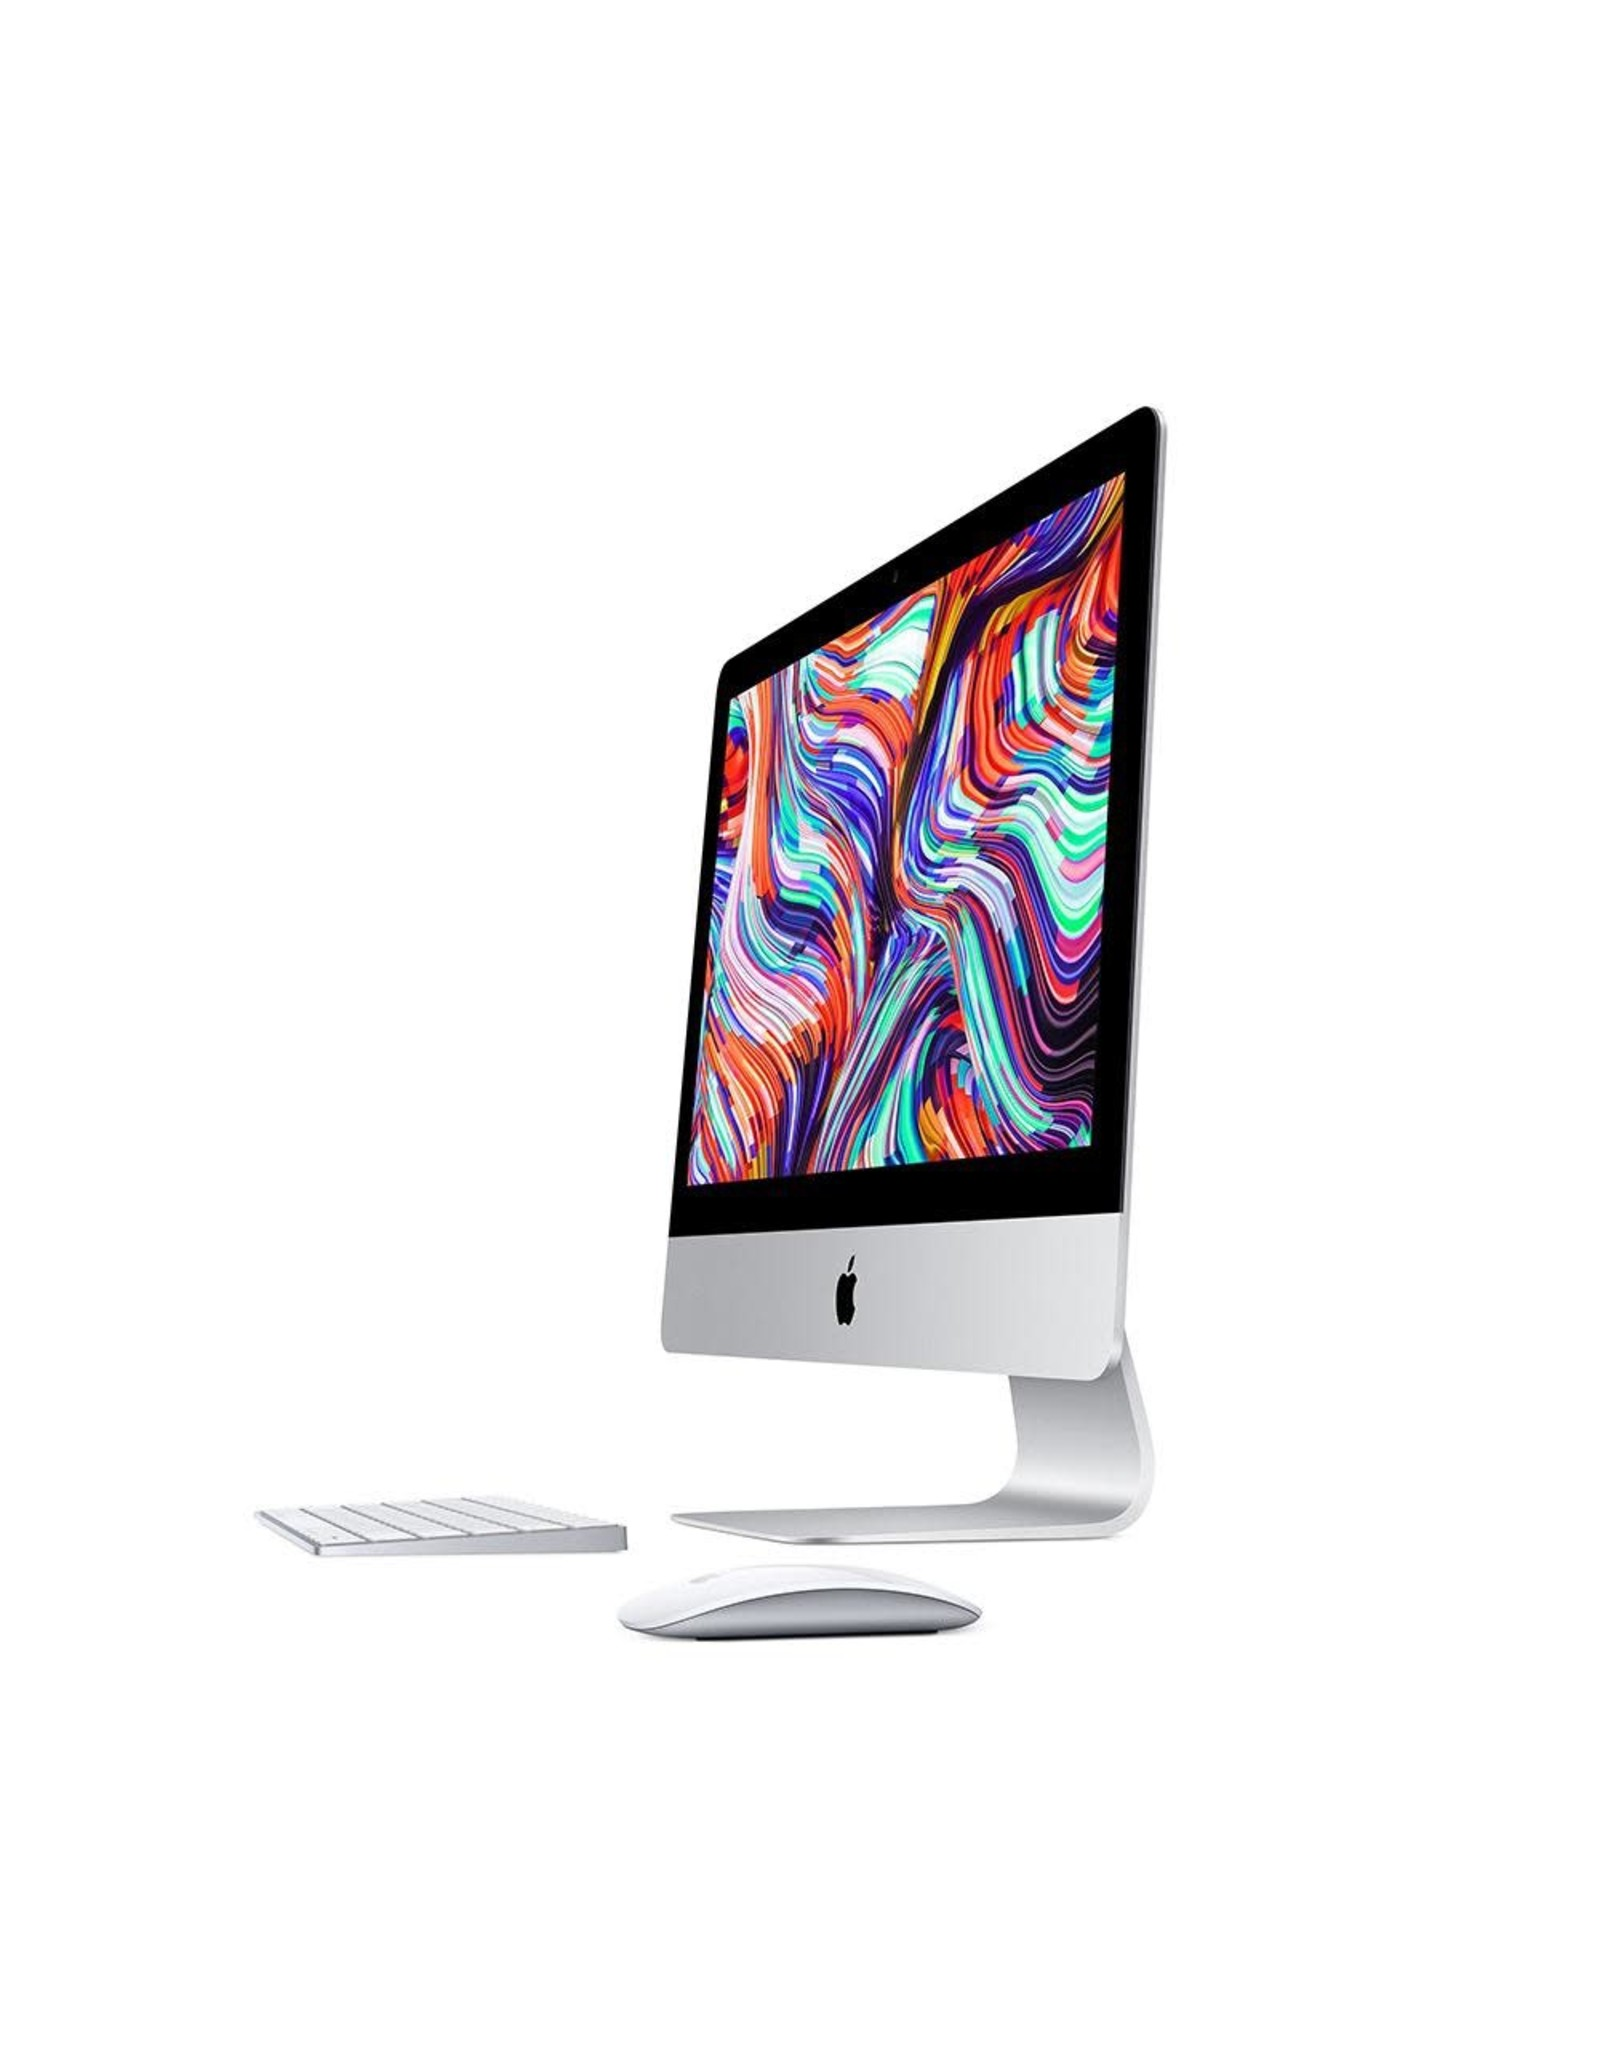 Apple Superseded - 21.5-inch iMac Retina 4K 3.0GHz 6-core 8th-generation Intel Core i5/8GB/256GB SSD/Radeon Pro 560X 4GB